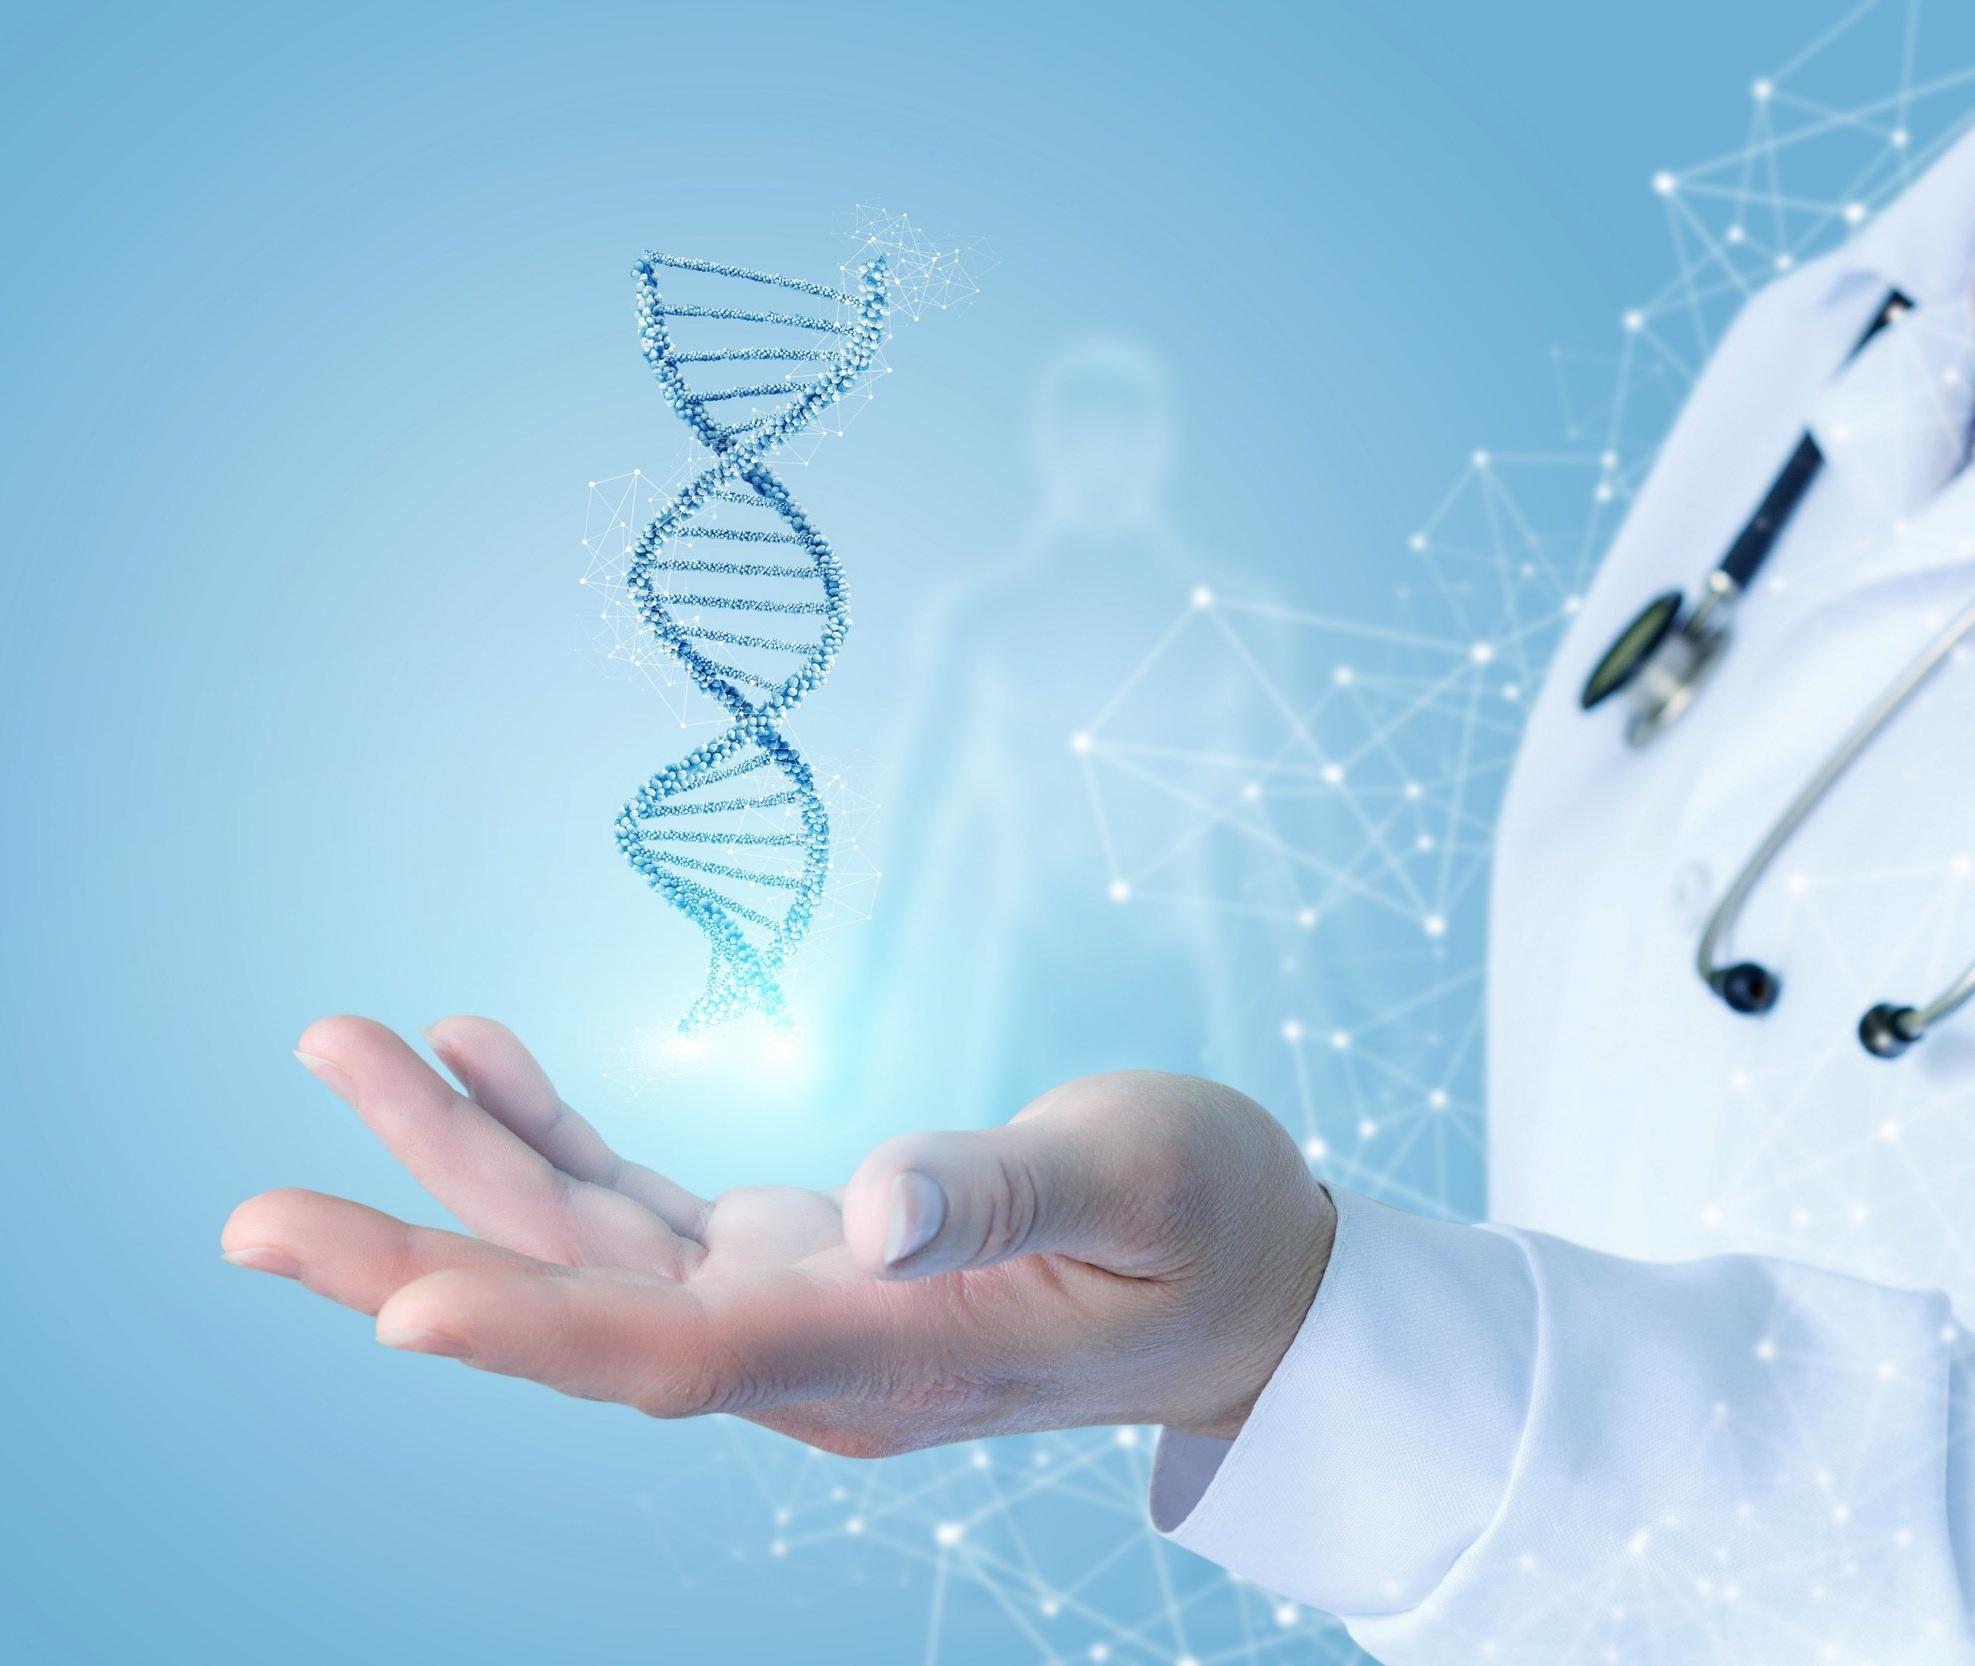 AdobeStock_220269704+genetic.jpg